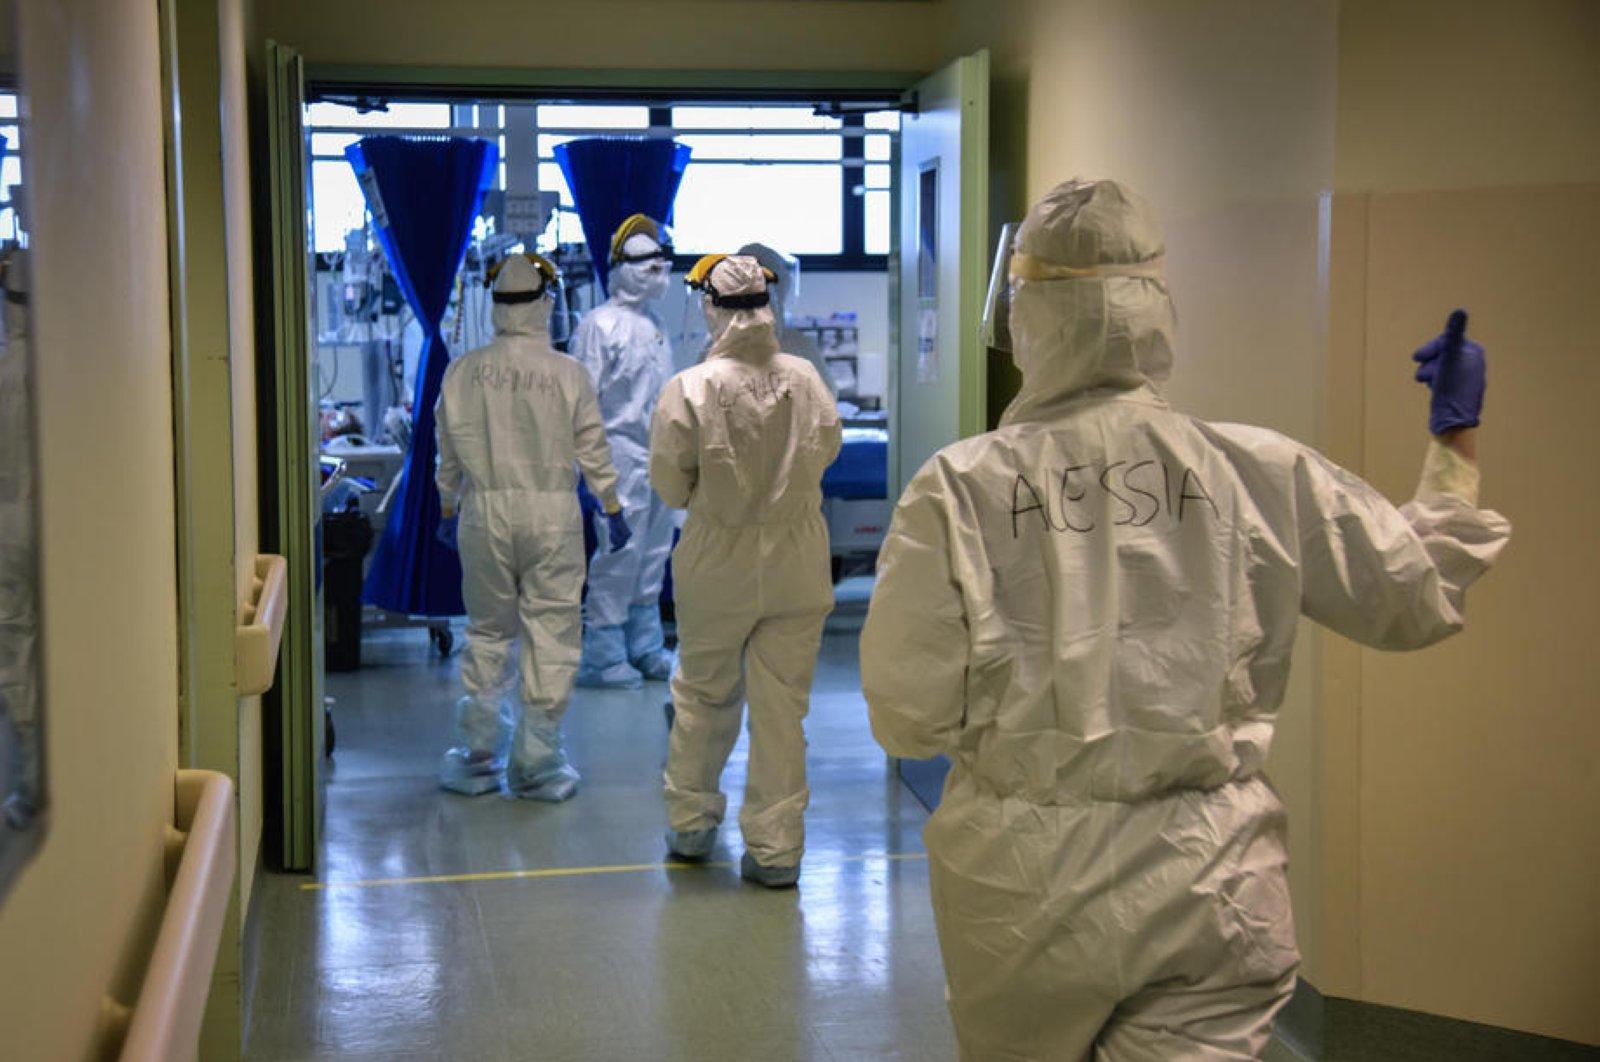 Doctors and nurses undertake dressing operations in the COVID-19 ward of Humanitas Hospital, Rozzano, Italy, April 8, 2020. (EPA Photo)